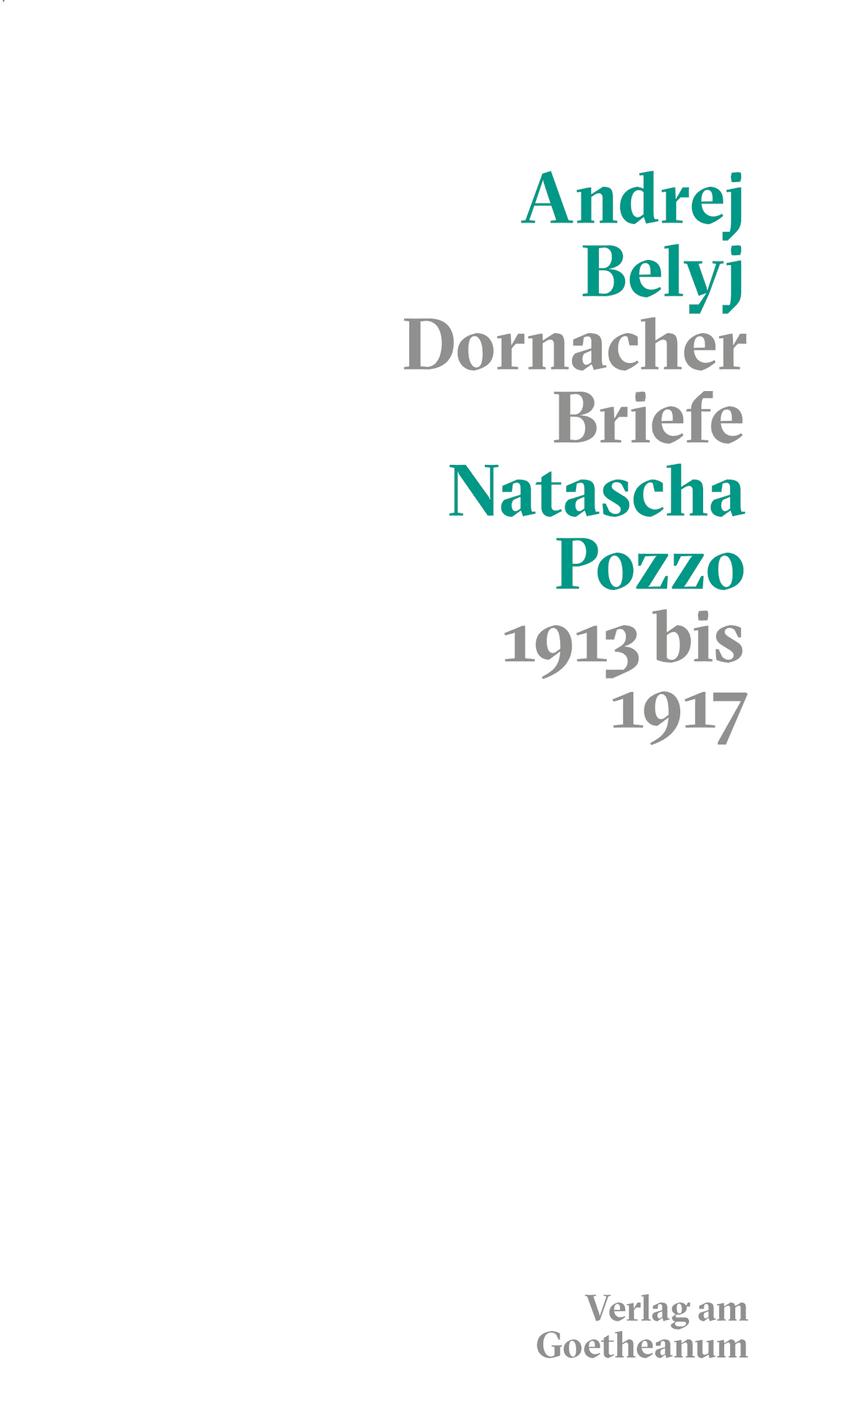 Cover Andrej Belyj Die Dornacher Briefe_Verlag am Goetheanum